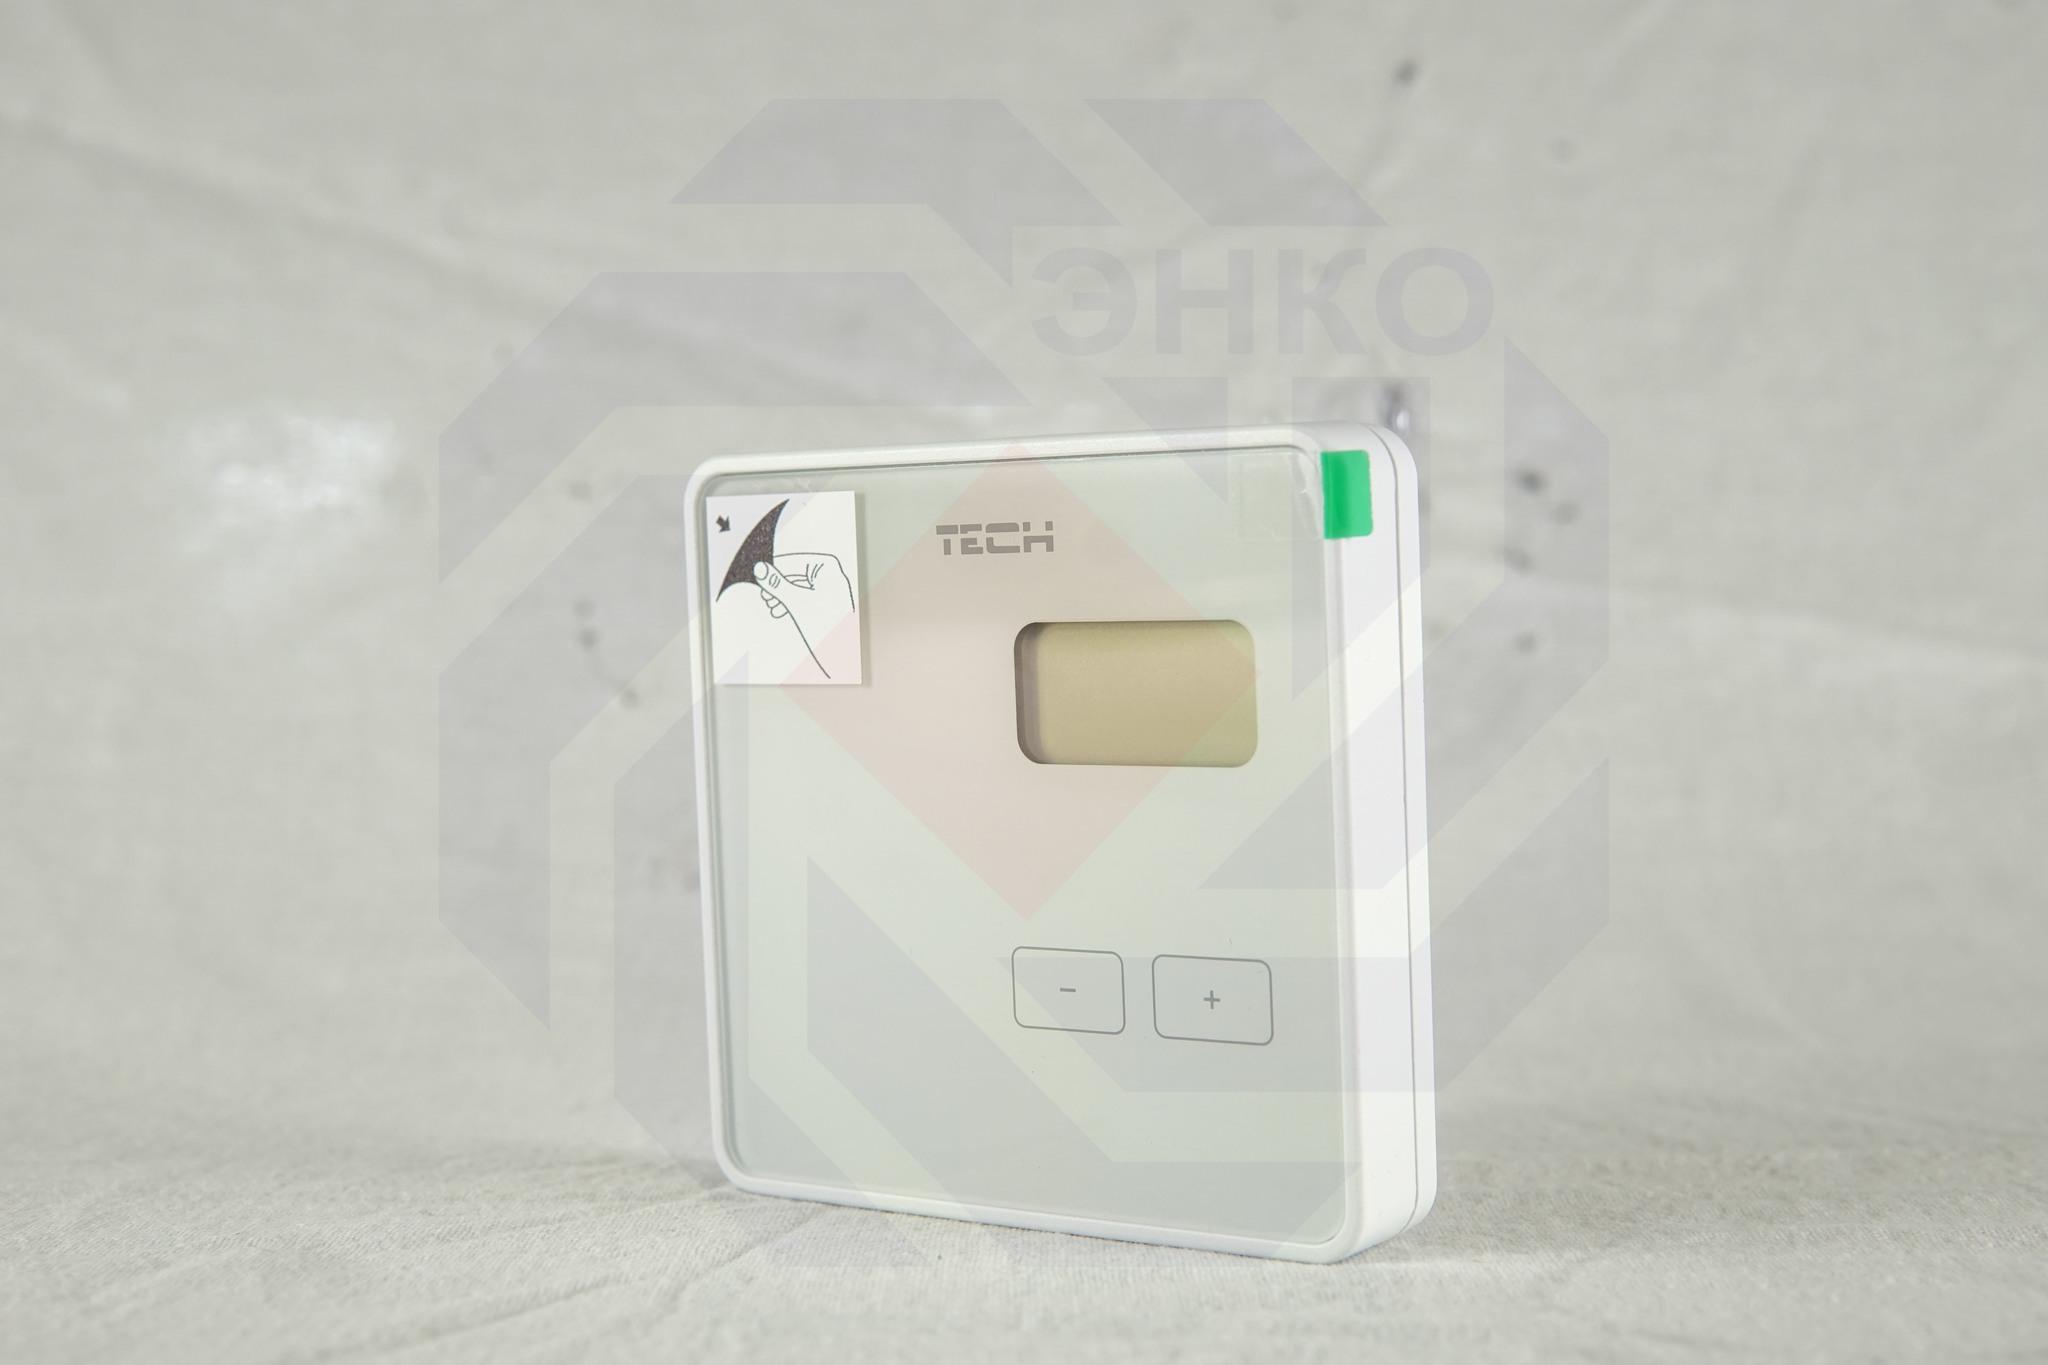 Термостат комнатный TECH STEROWNIKI ST-R-8B белый